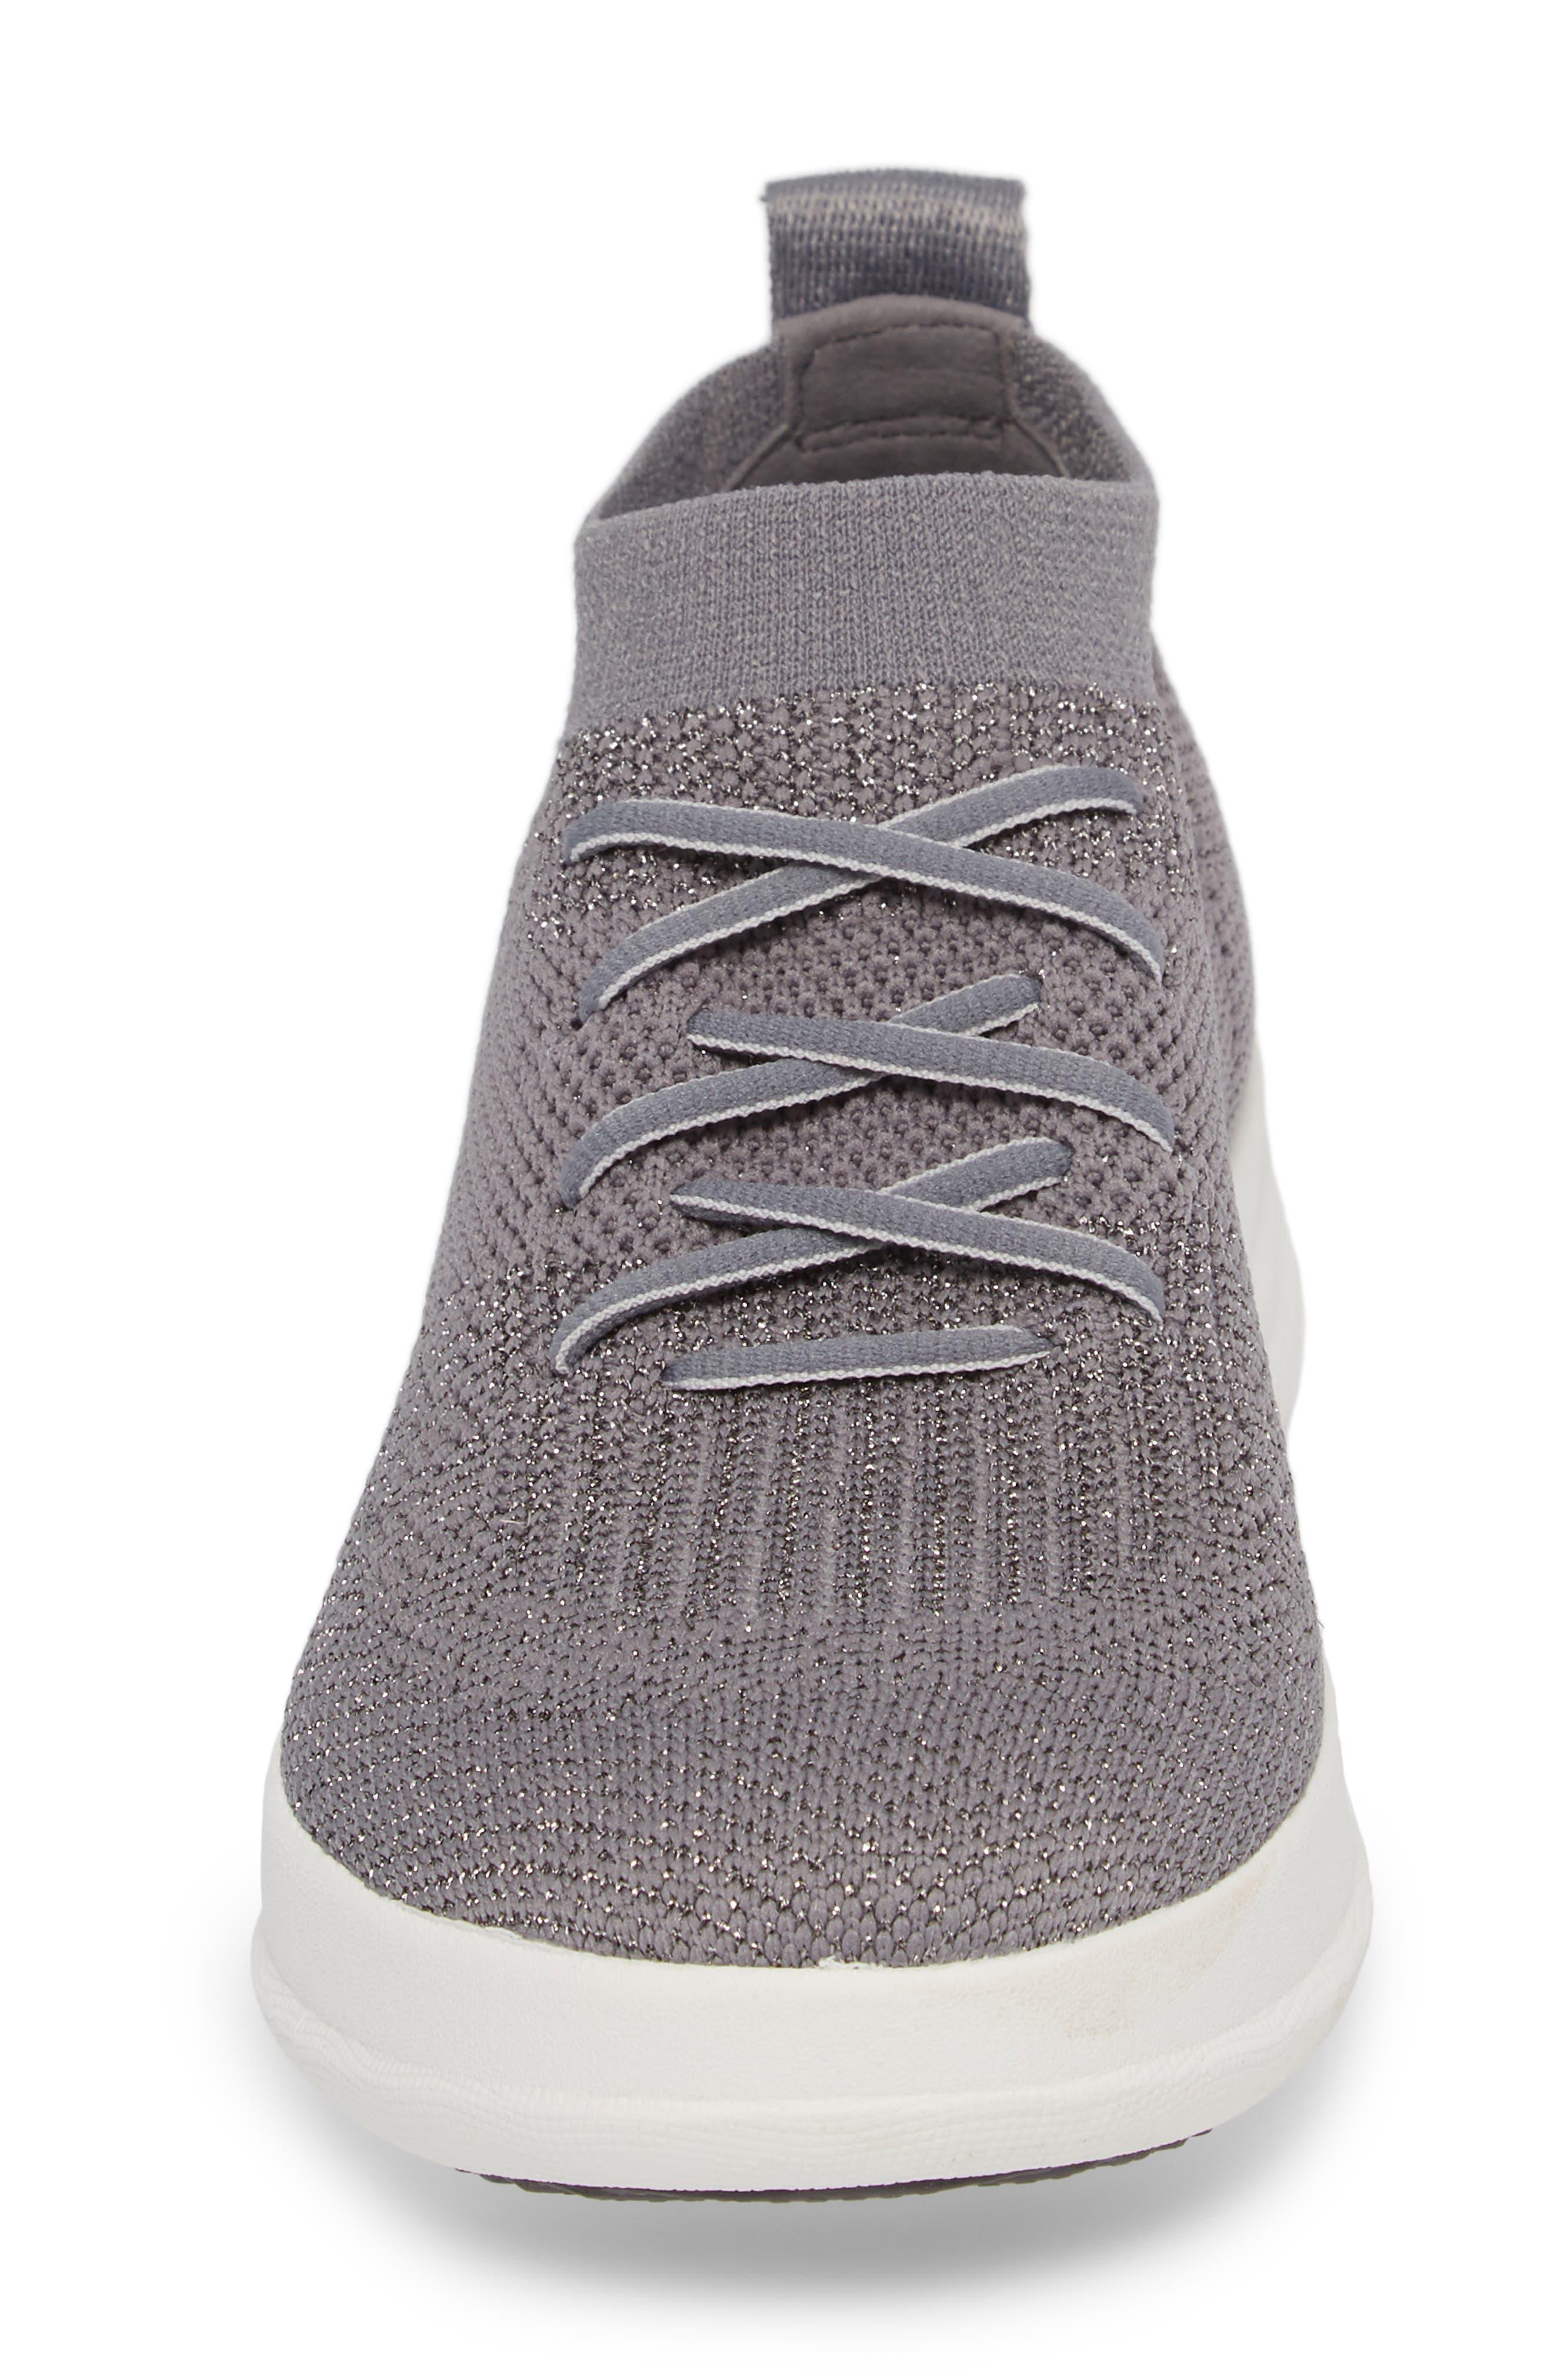 Uberknit<sup>™</sup> Slip-On High-Top Sneaker,                             Alternate thumbnail 4, color,                             Charcoal/ Metallic Pewter